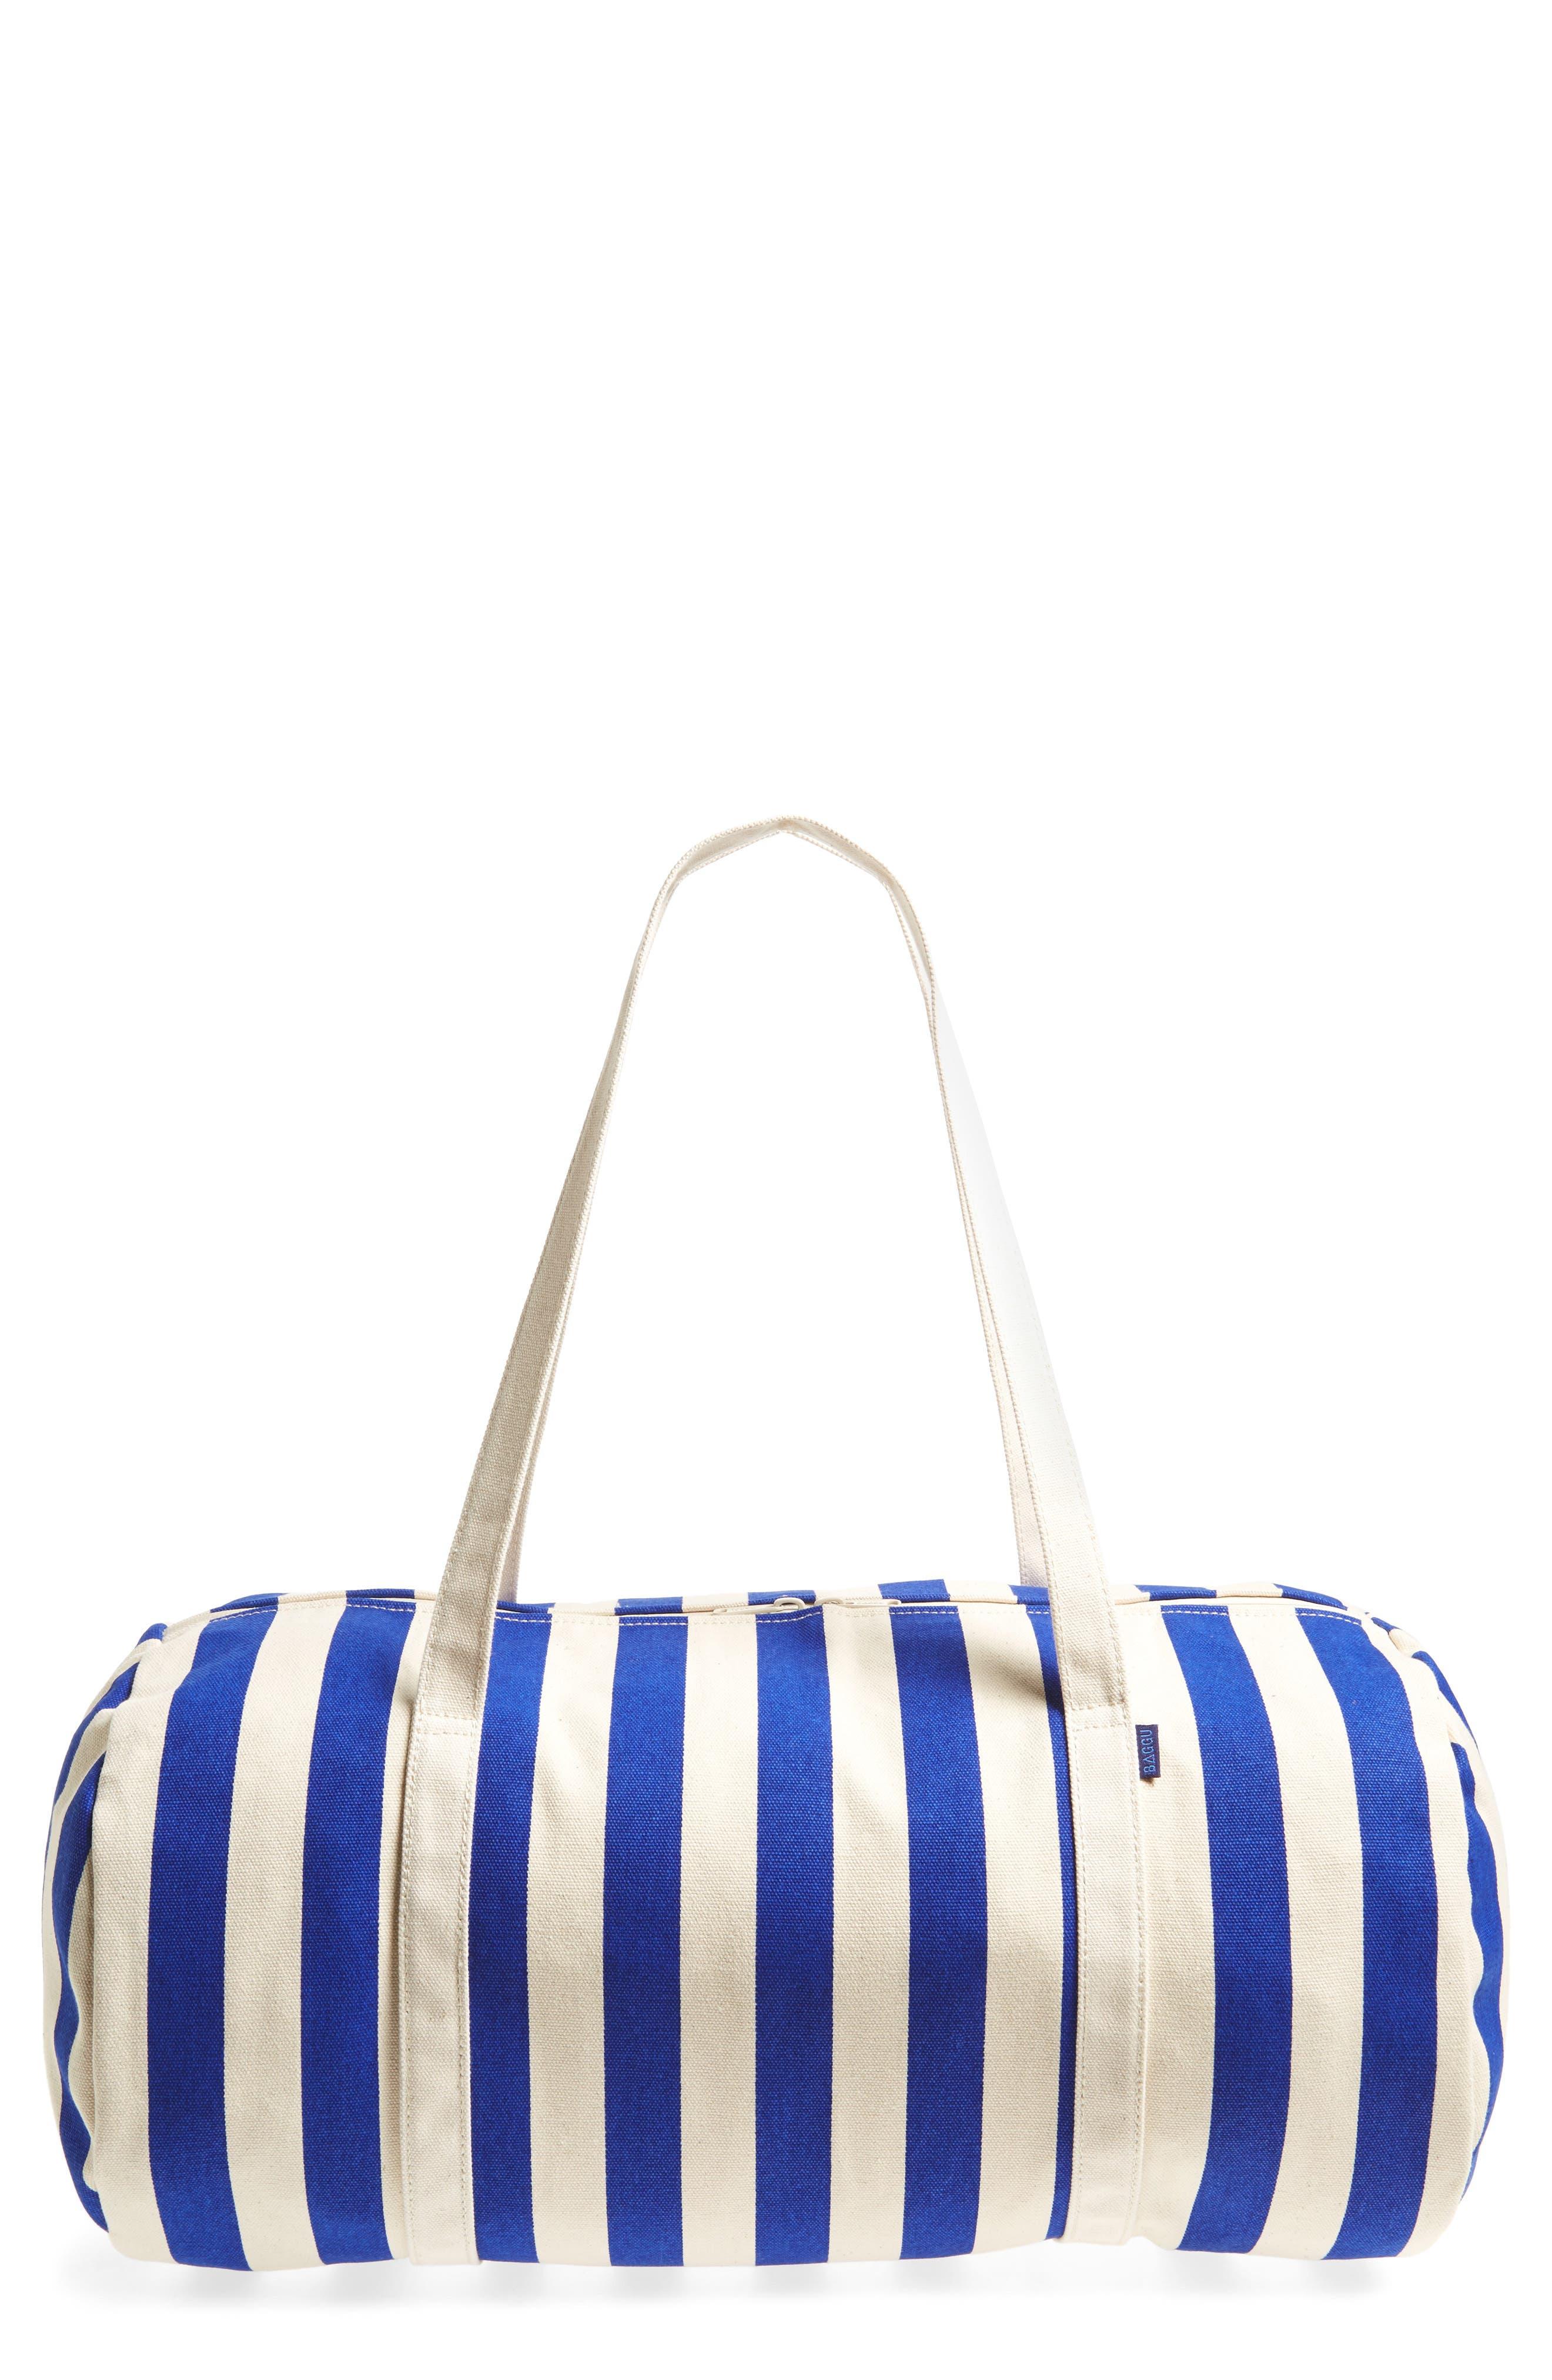 Baggu Canvas Duffel Bag